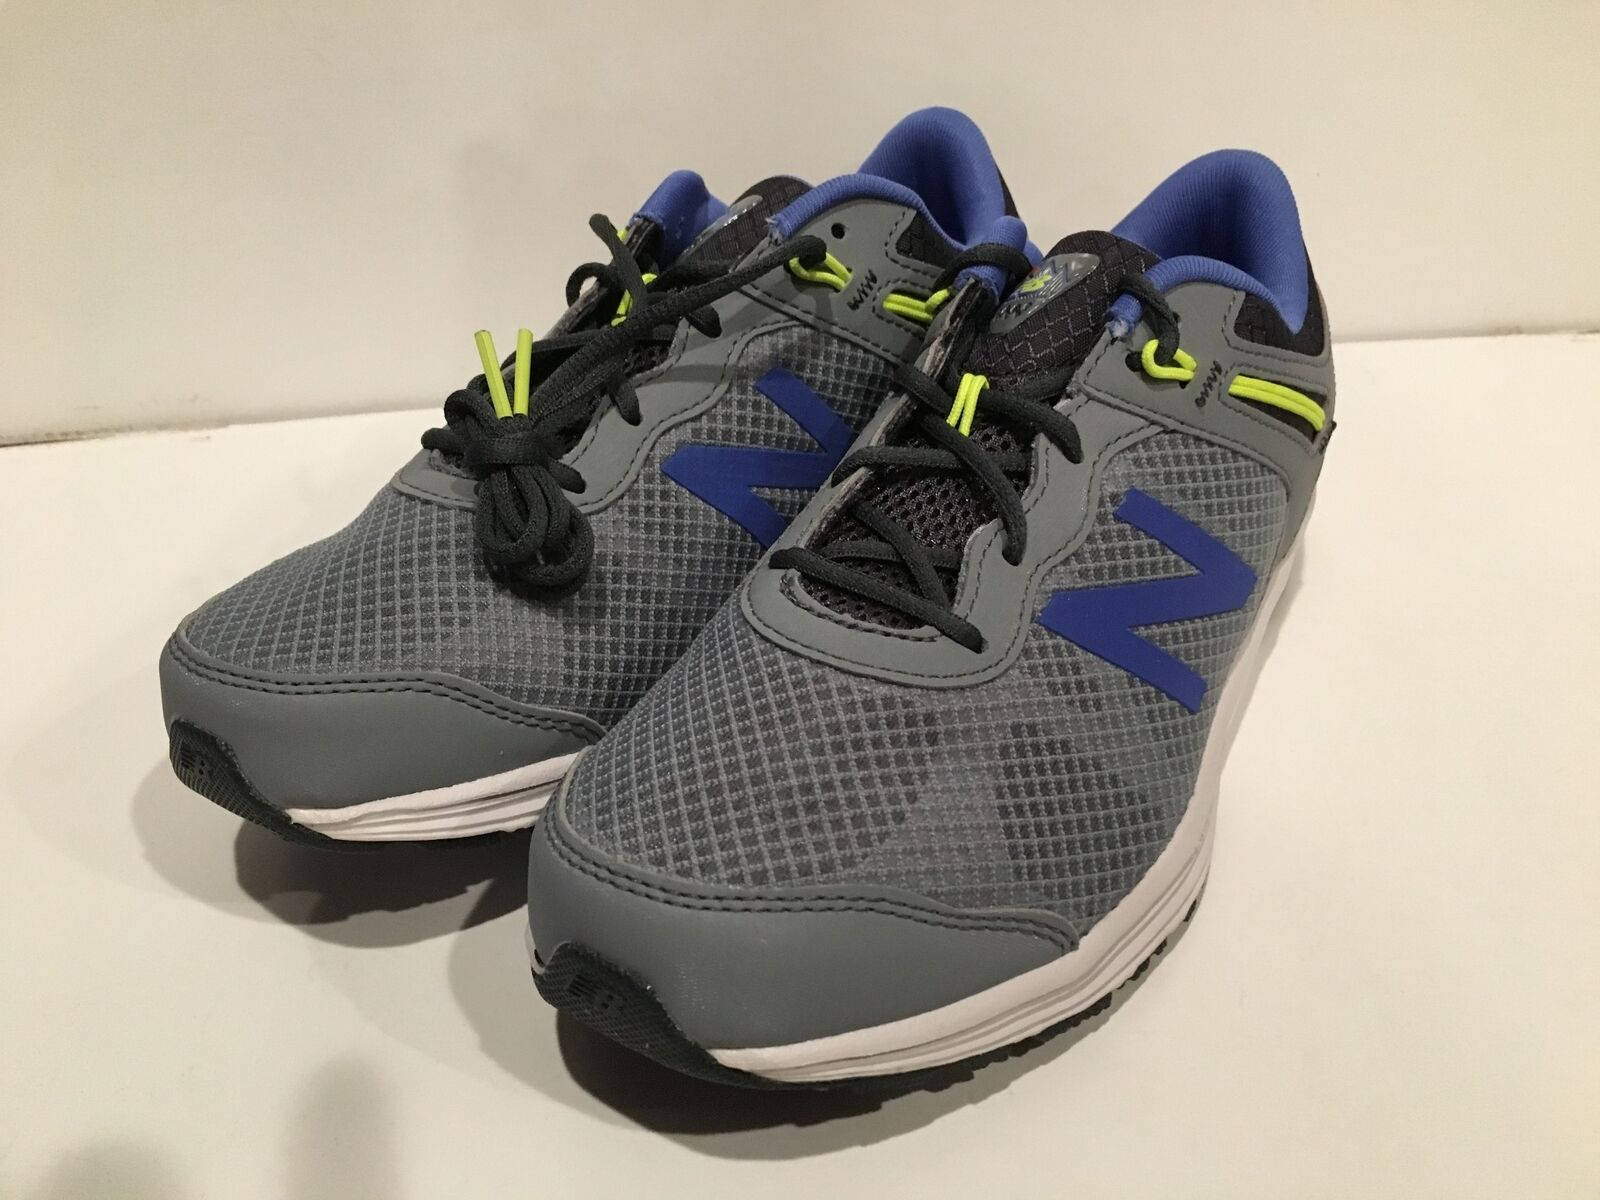 New Balance Women's WTE370P1 Running Shoes (1358/1359) Gray/Blue Size 8M